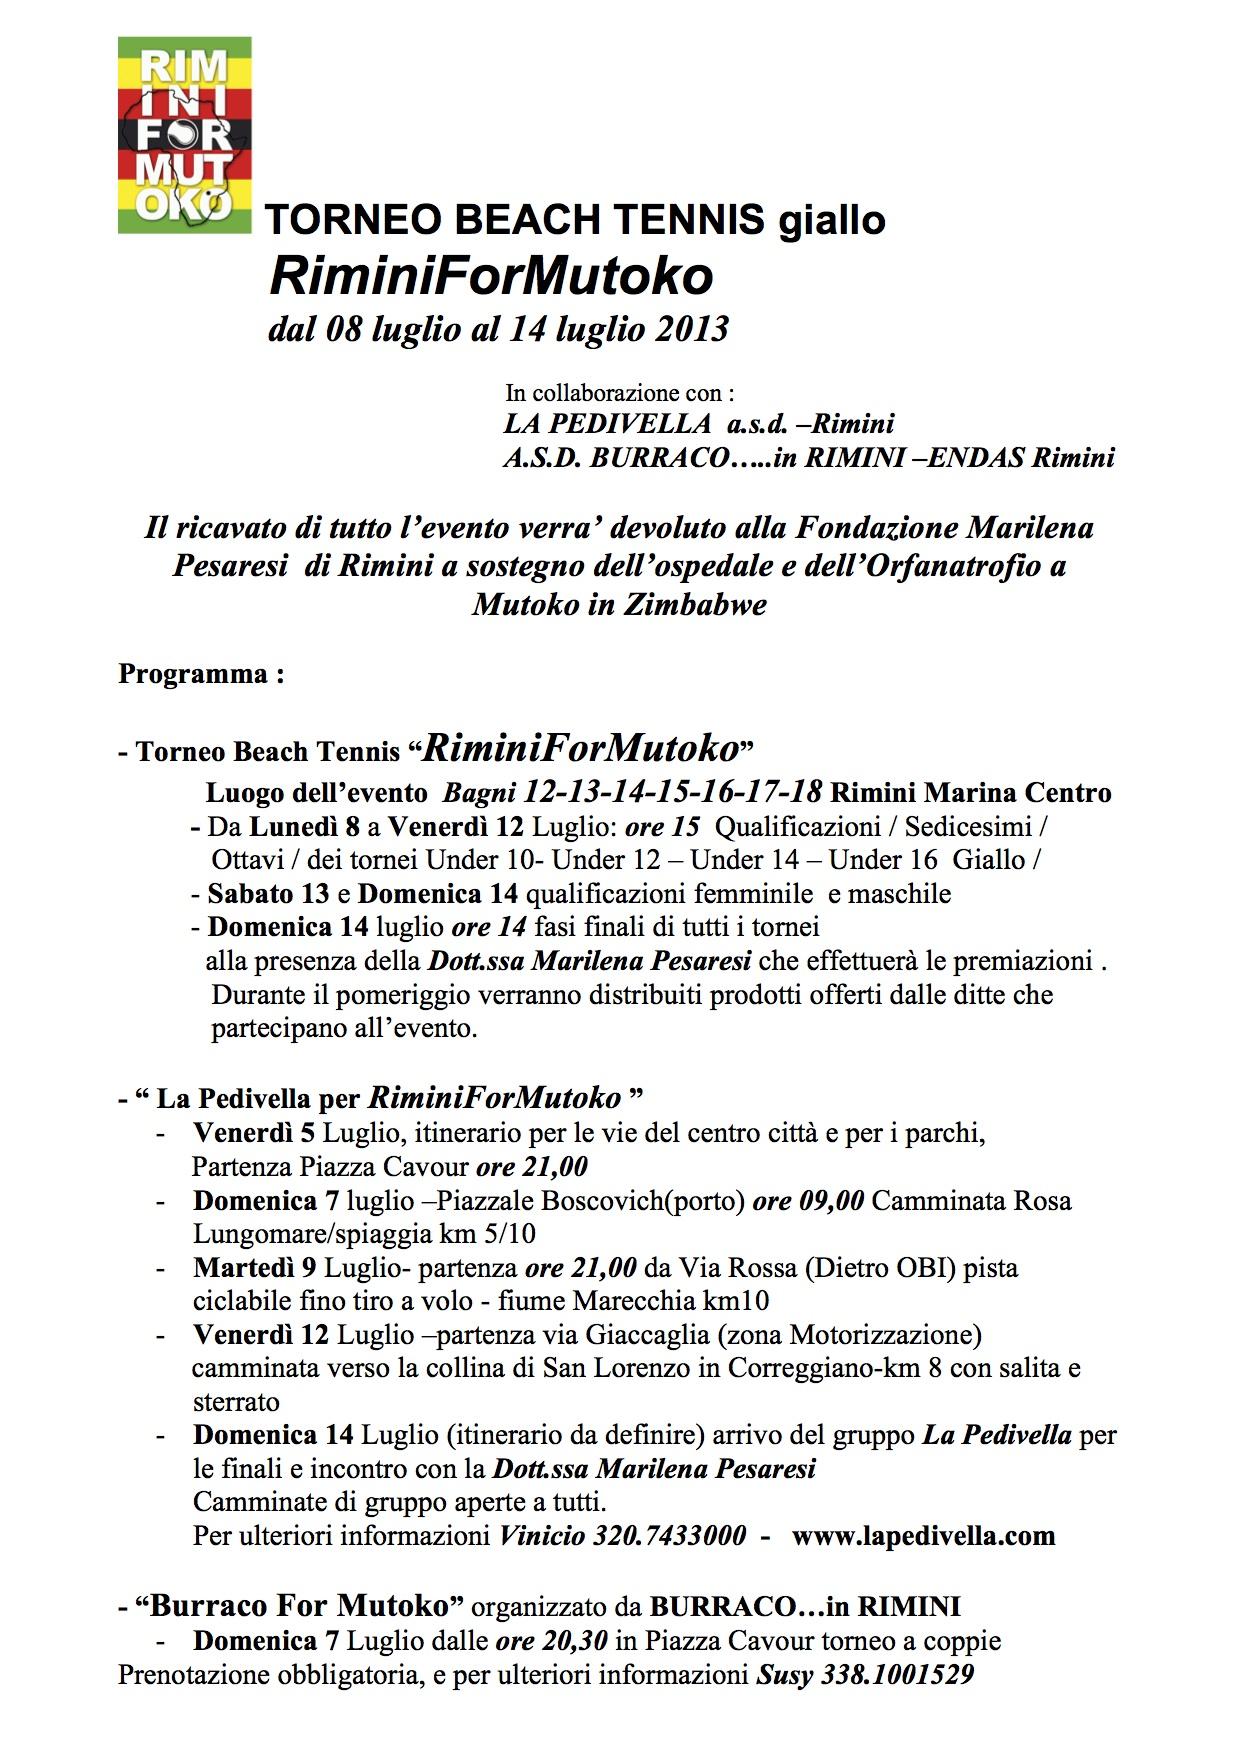 TORNEO BEACH TENNIS RIMINI For MUTOKO